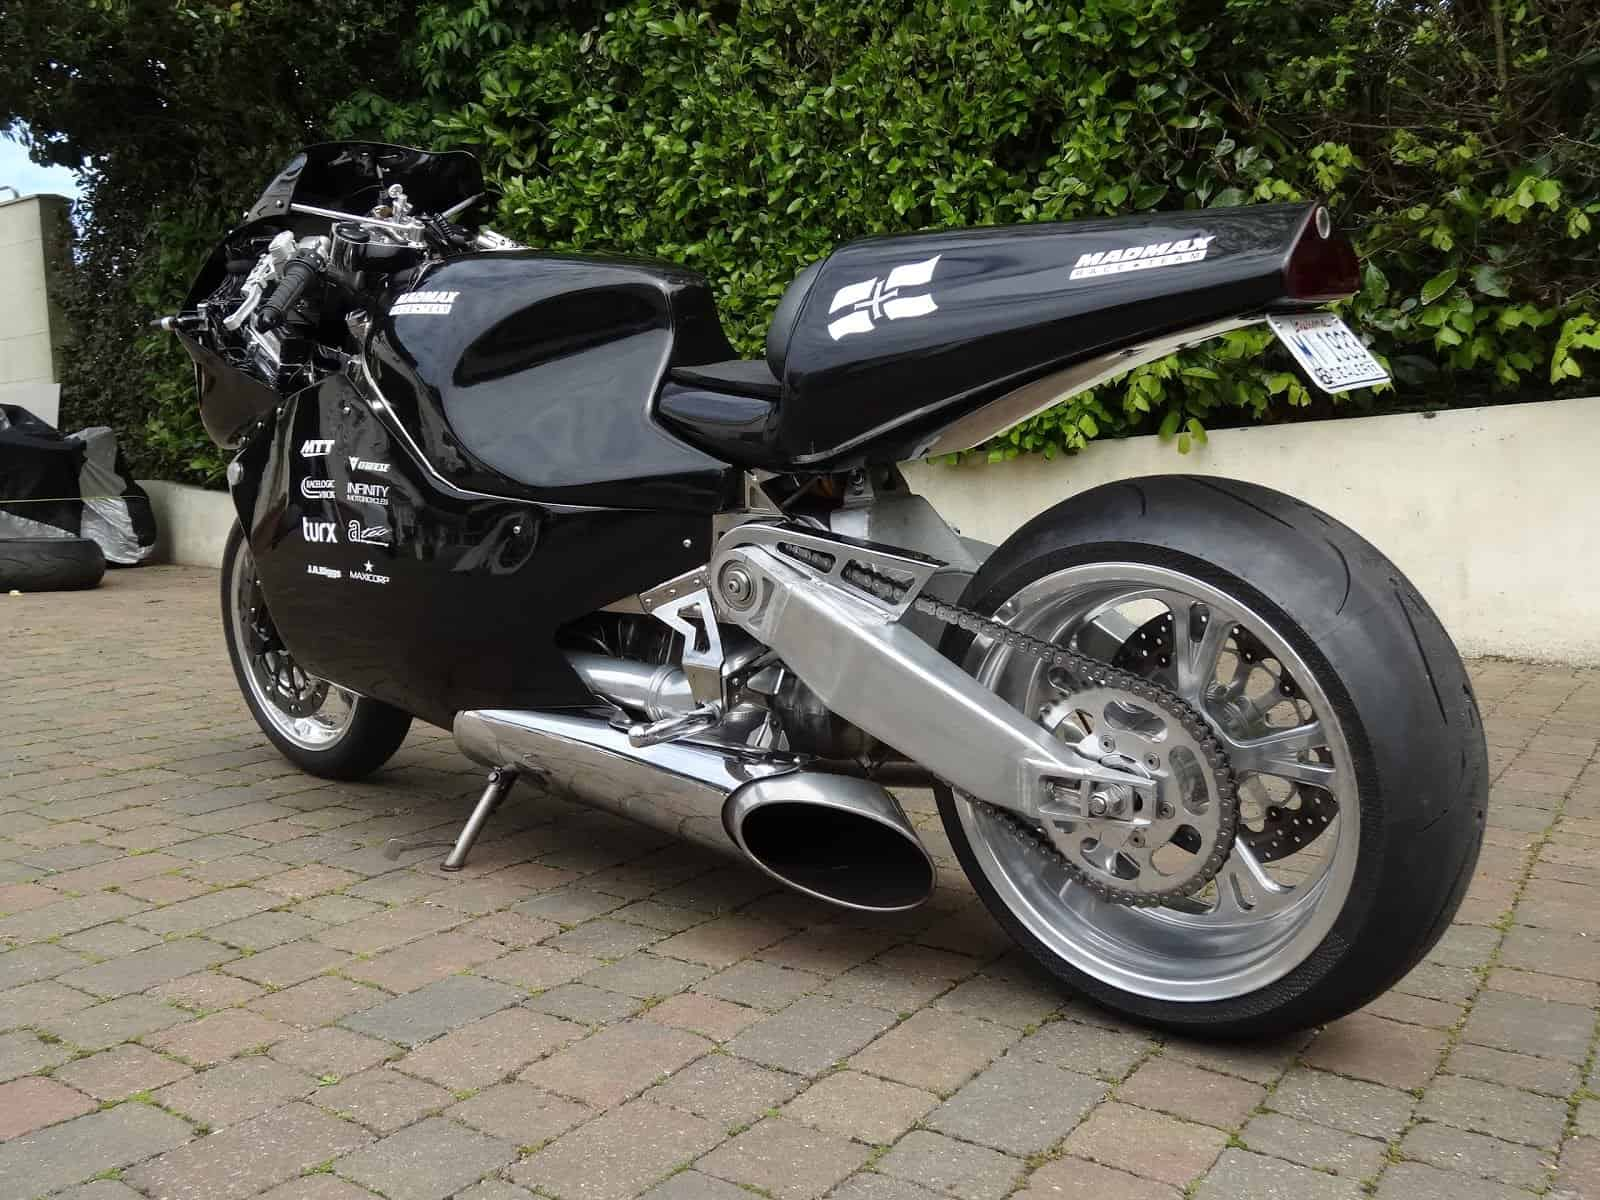 MTT Turbine Superbike